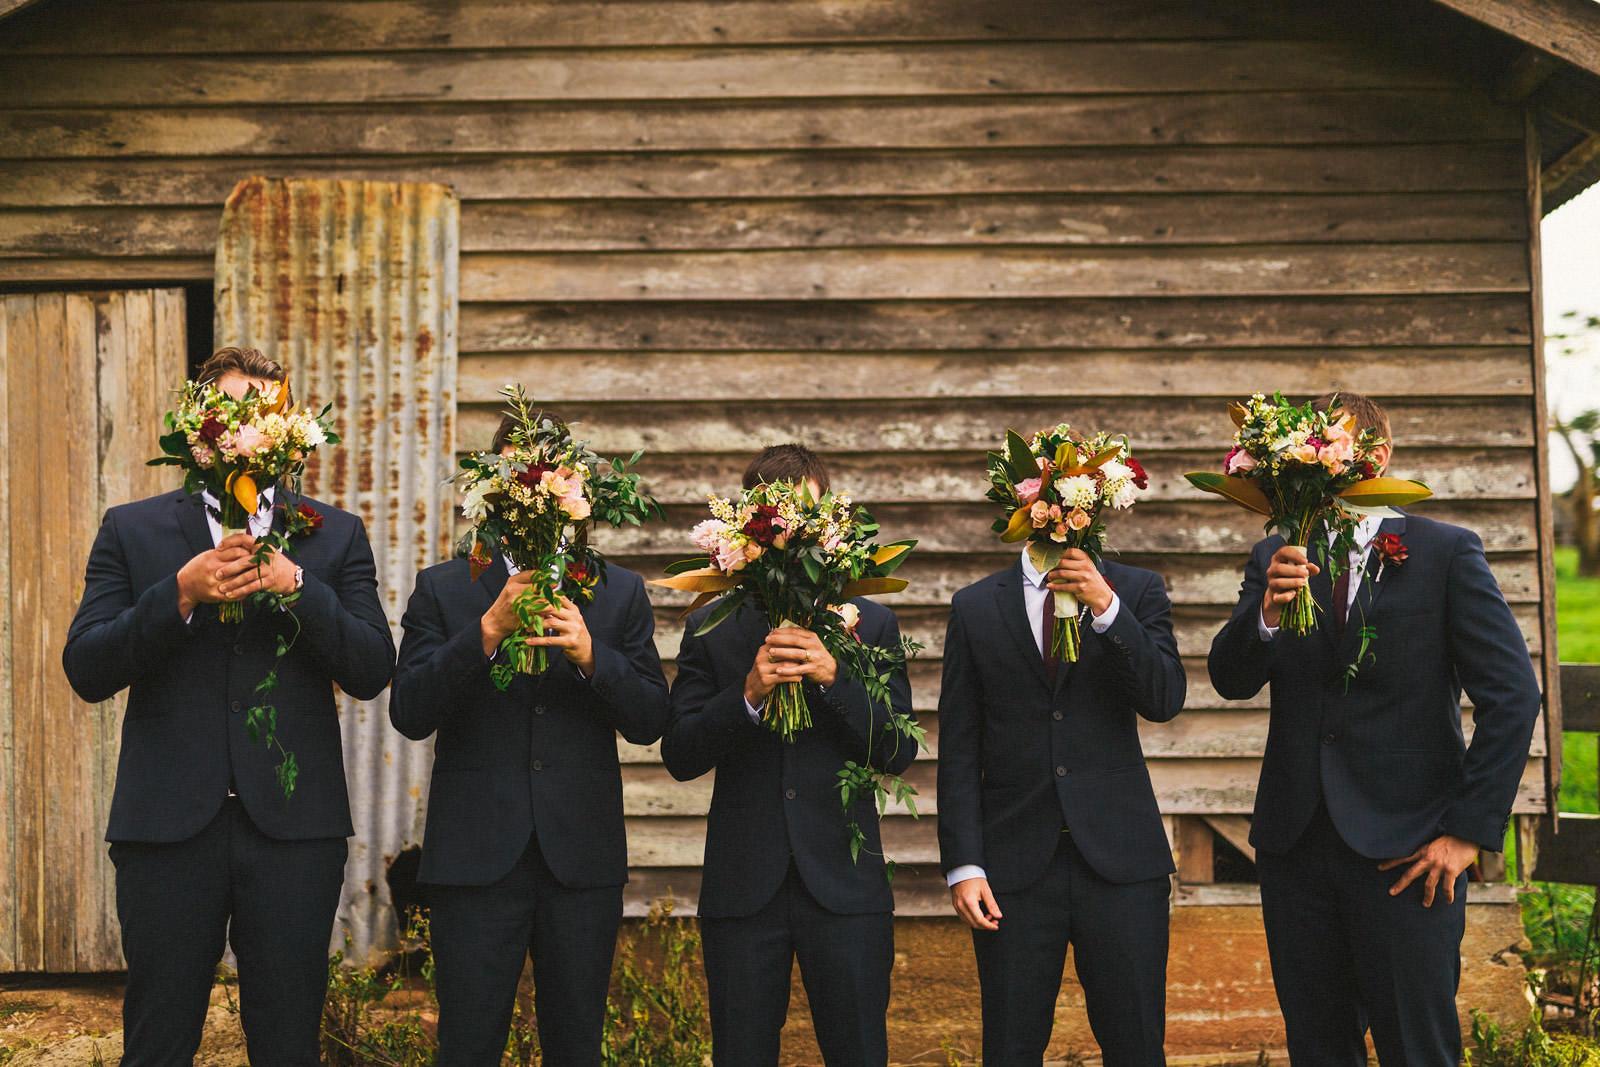 tablelands_wedding_0033